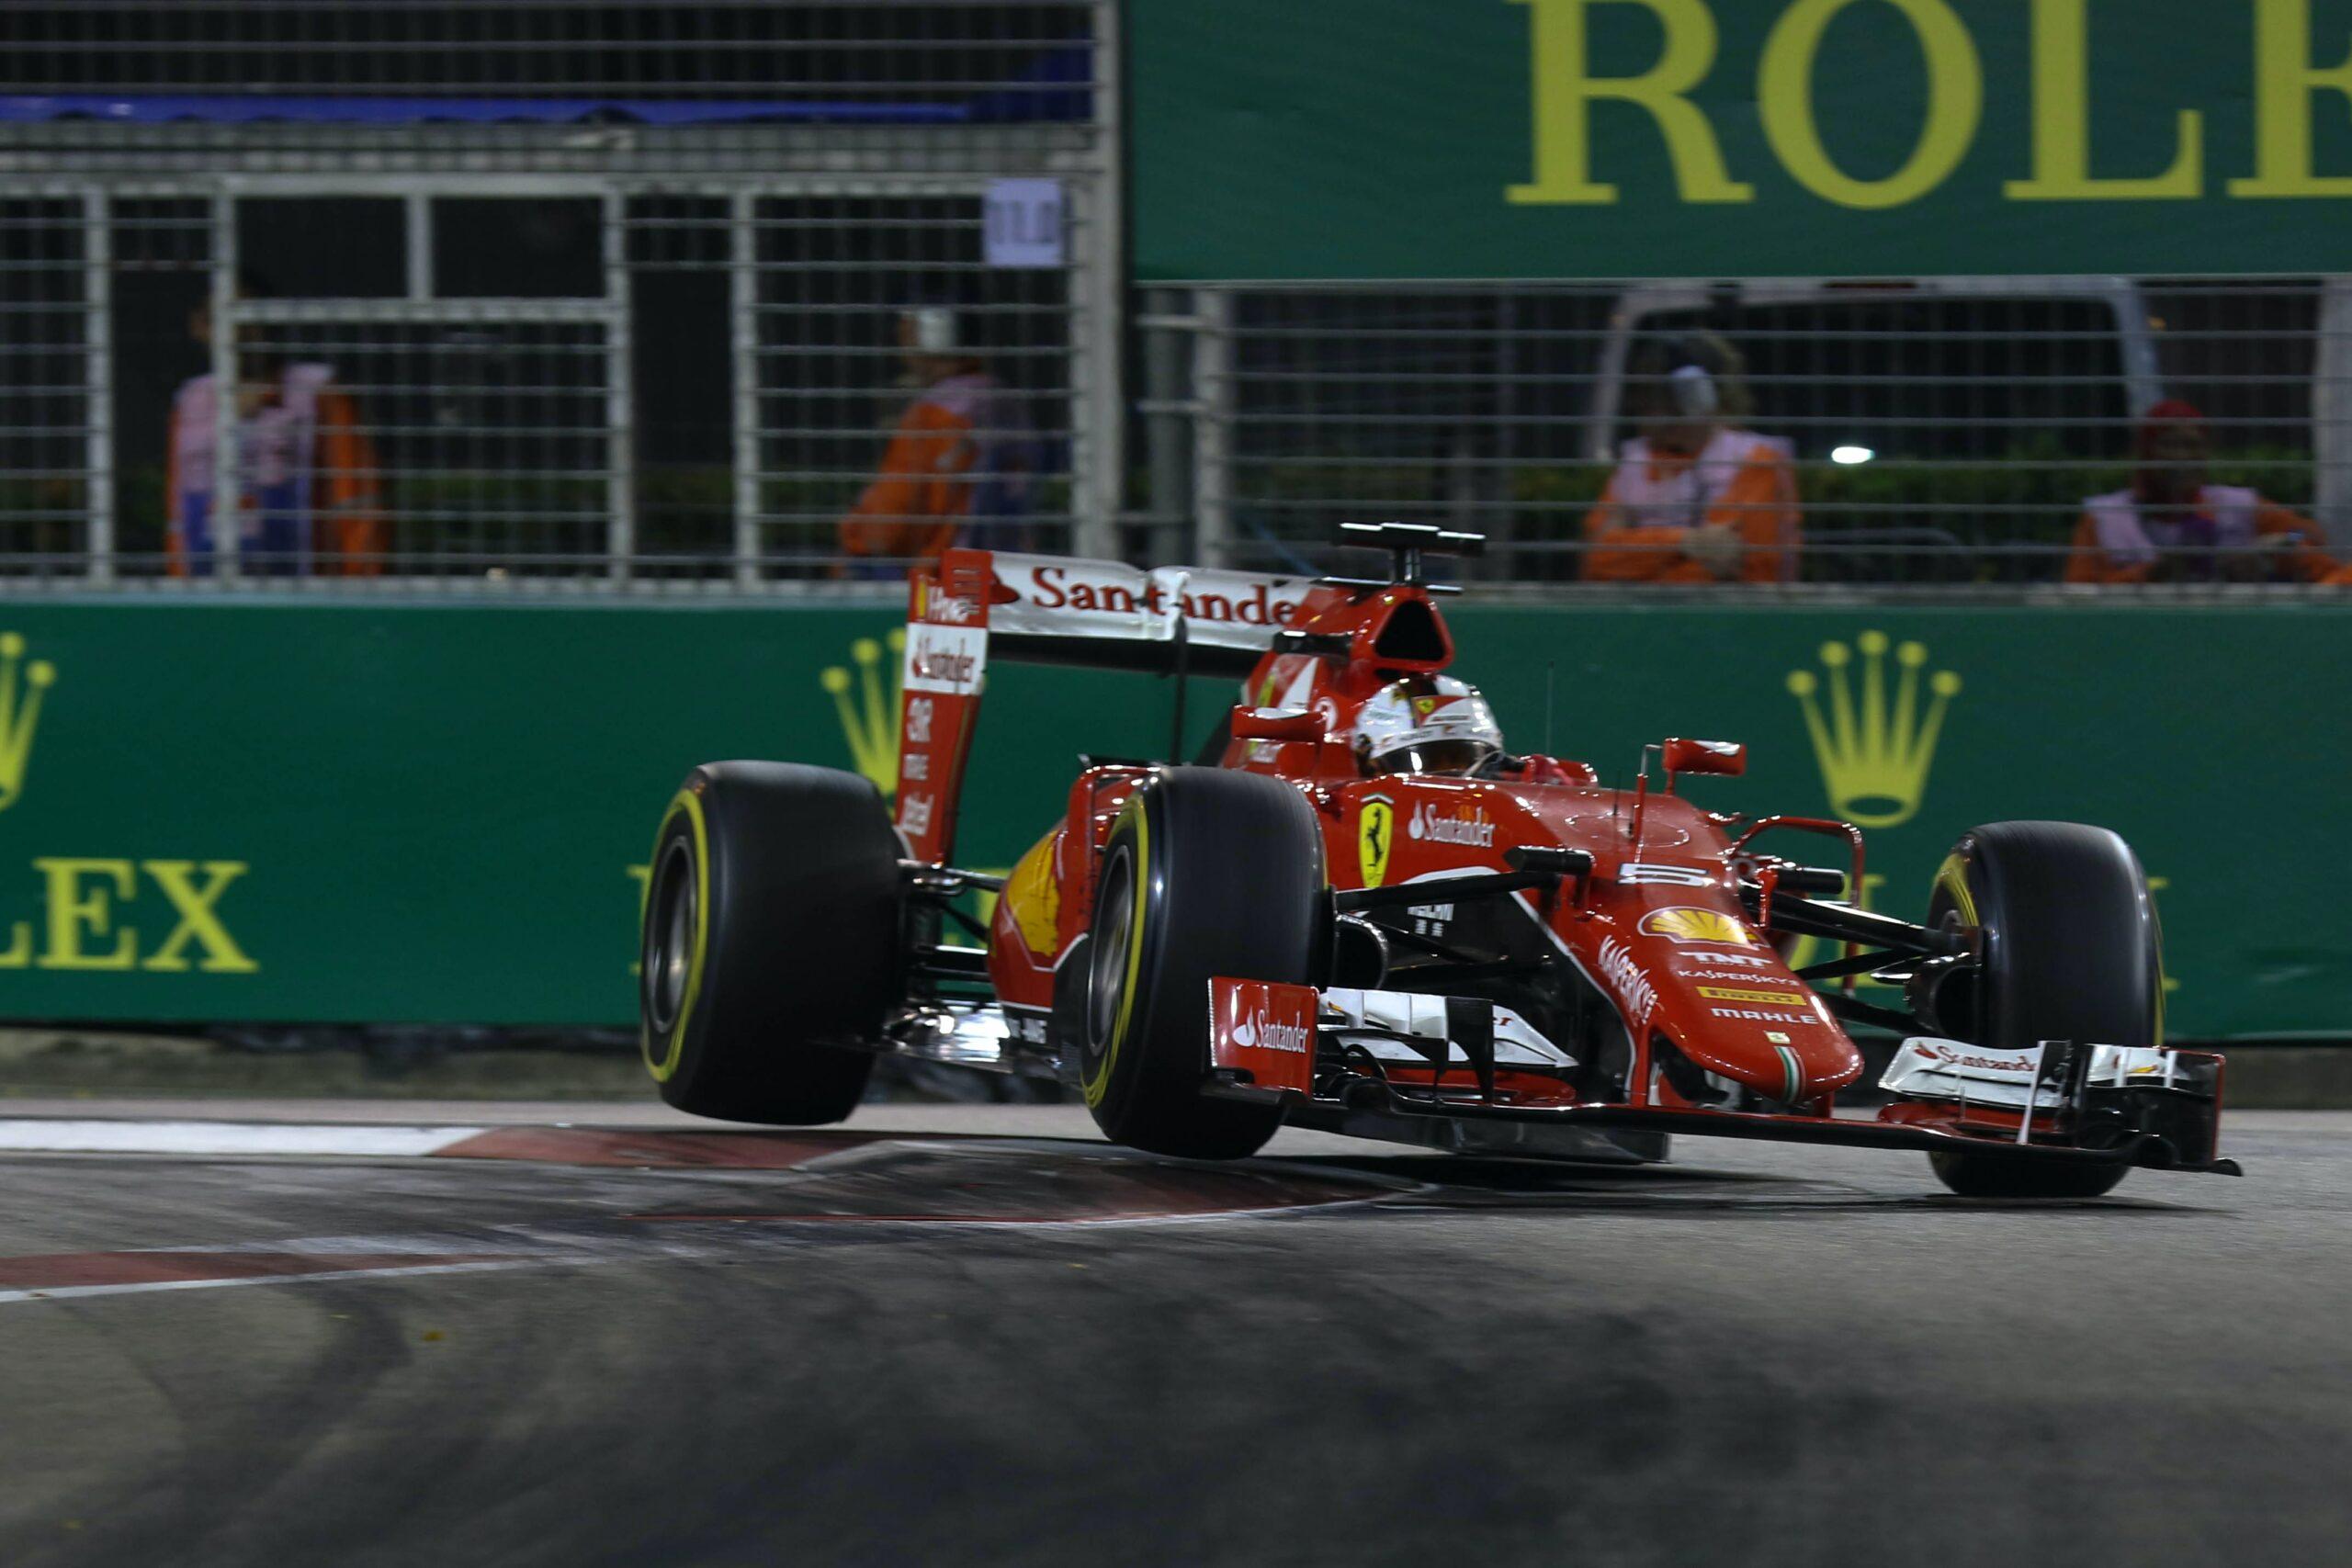 Formule 1 GP Singapore – Hotelovernachtingen 4-sterren Hotels – Marina Bay 2021